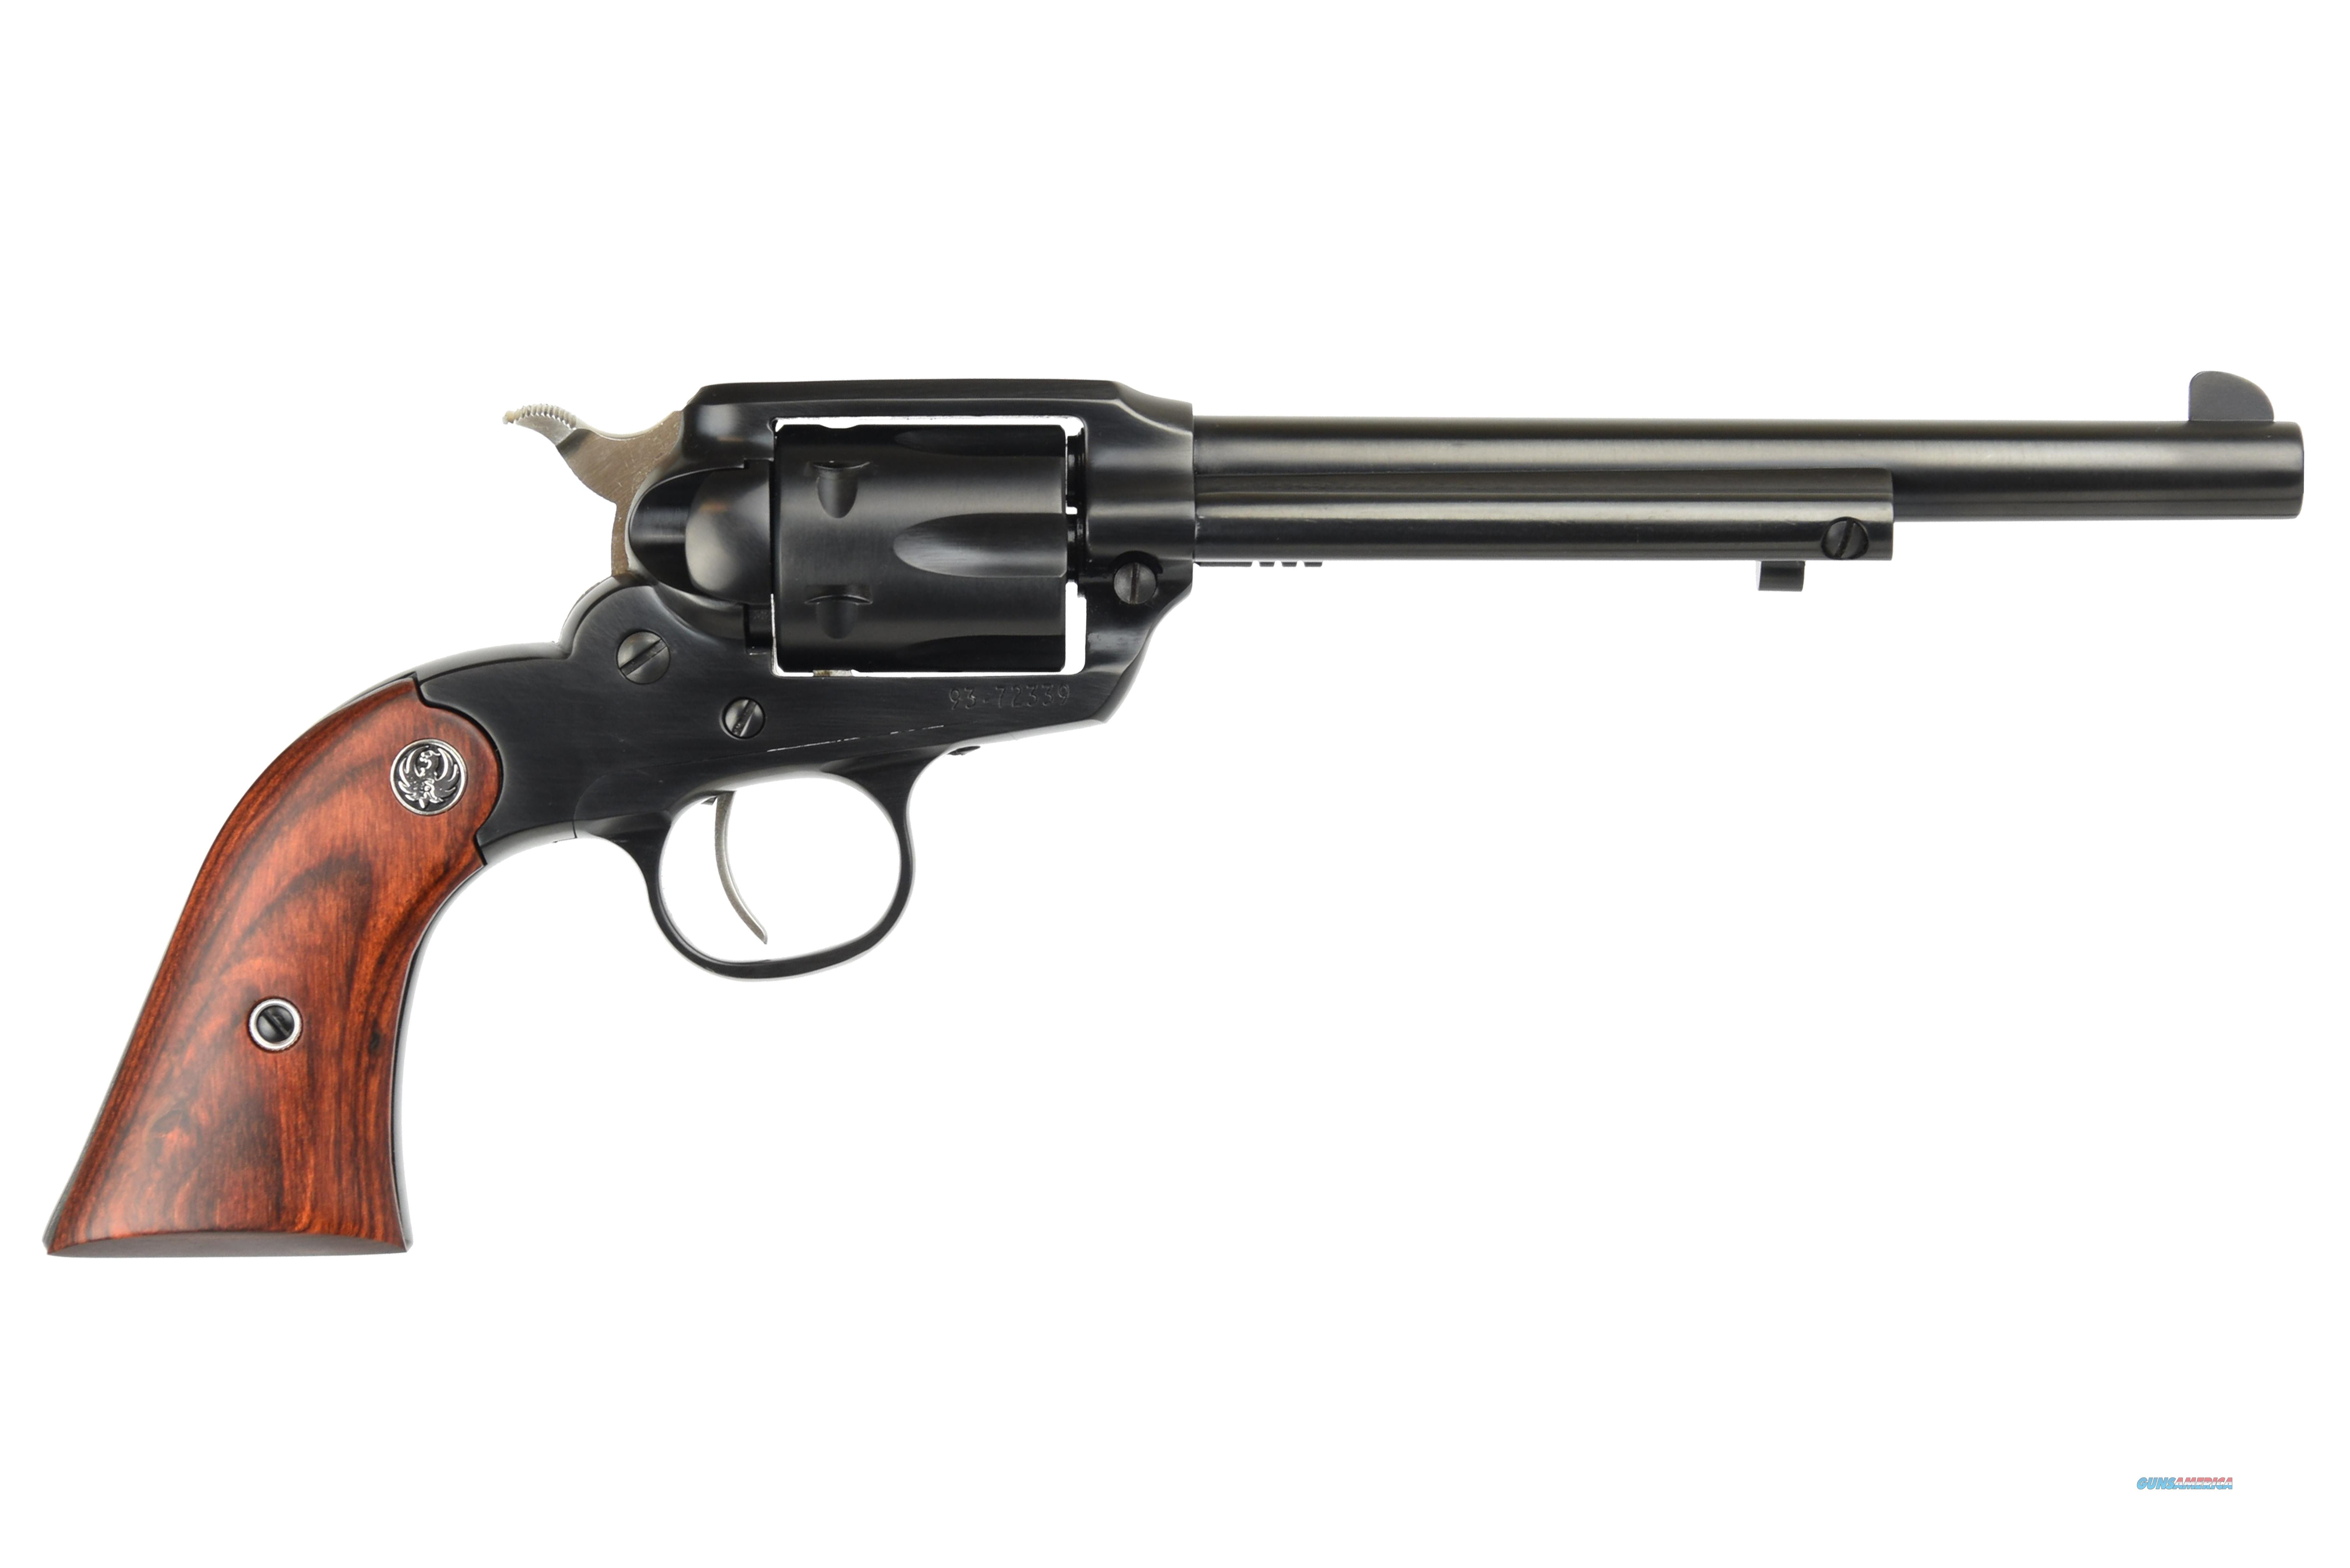 "Ruger Bearcat 22 LR Blued 6"" BBL 0922 NIB 6 RND  Guns > Pistols > Ruger Single Action Revolvers > Bearcat"